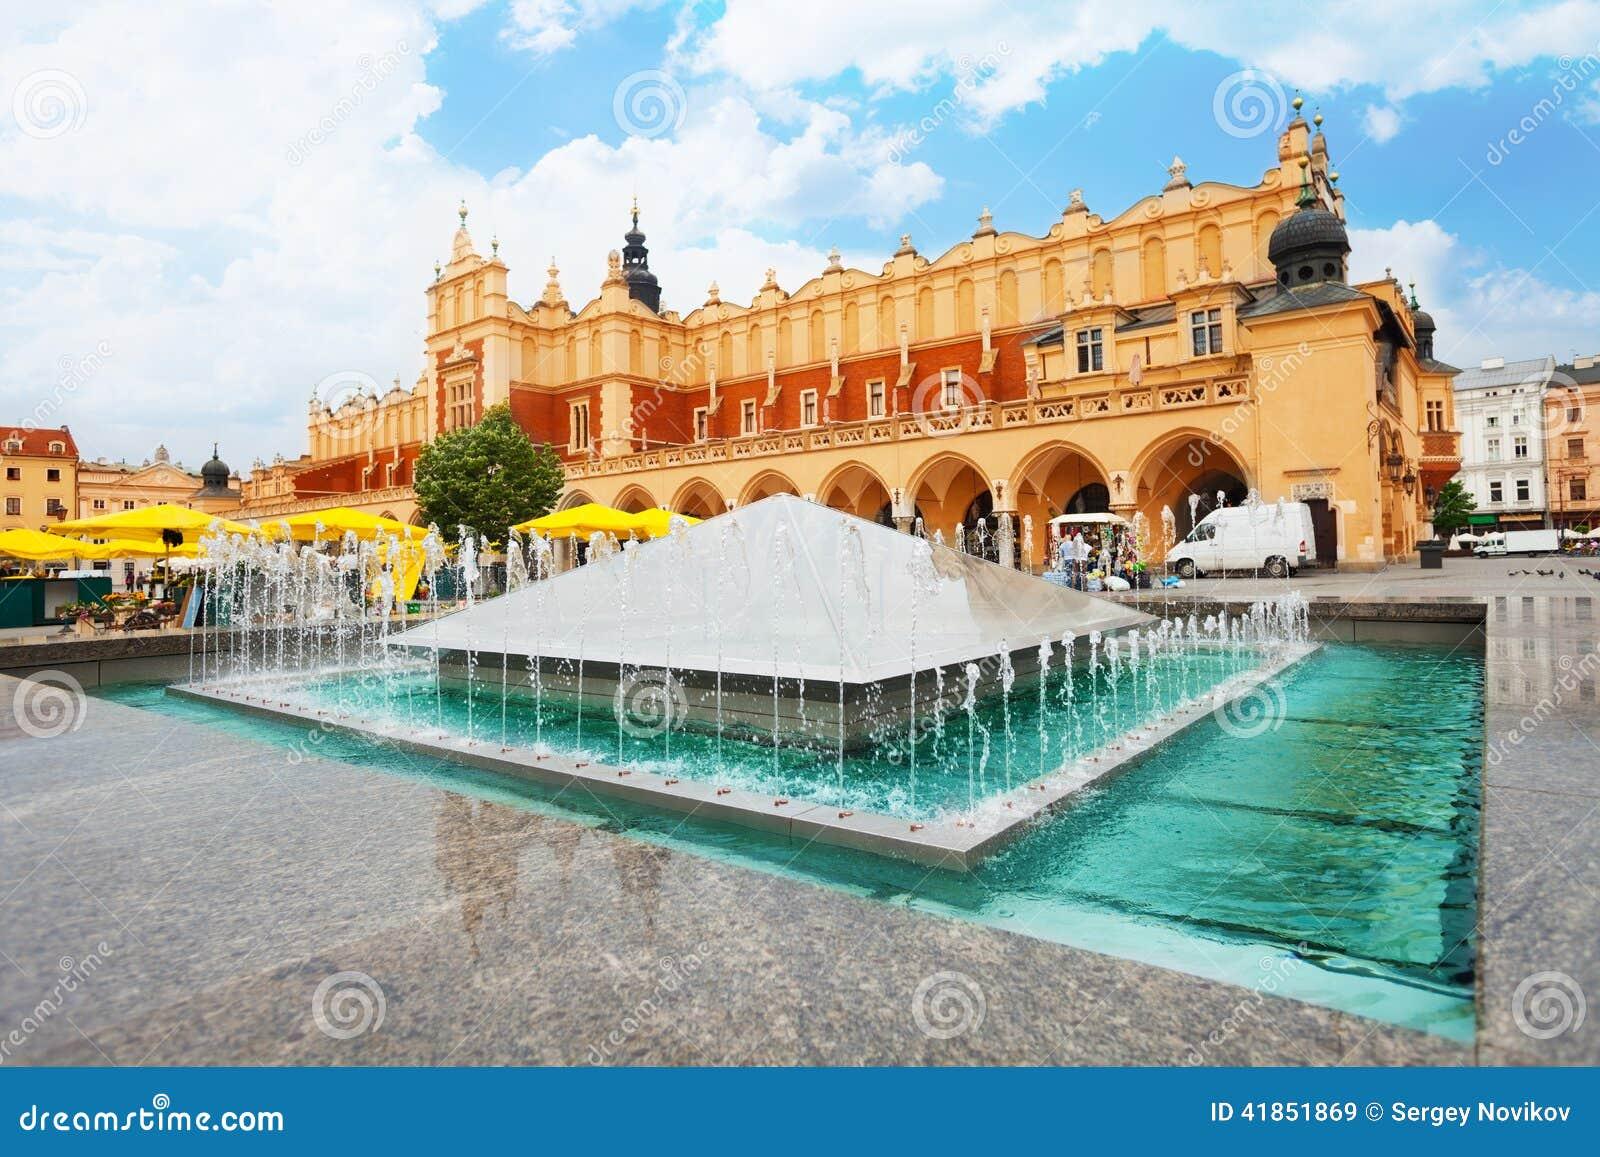 Panno Corridoio su Rynek Glowny e fontana a Cracovia